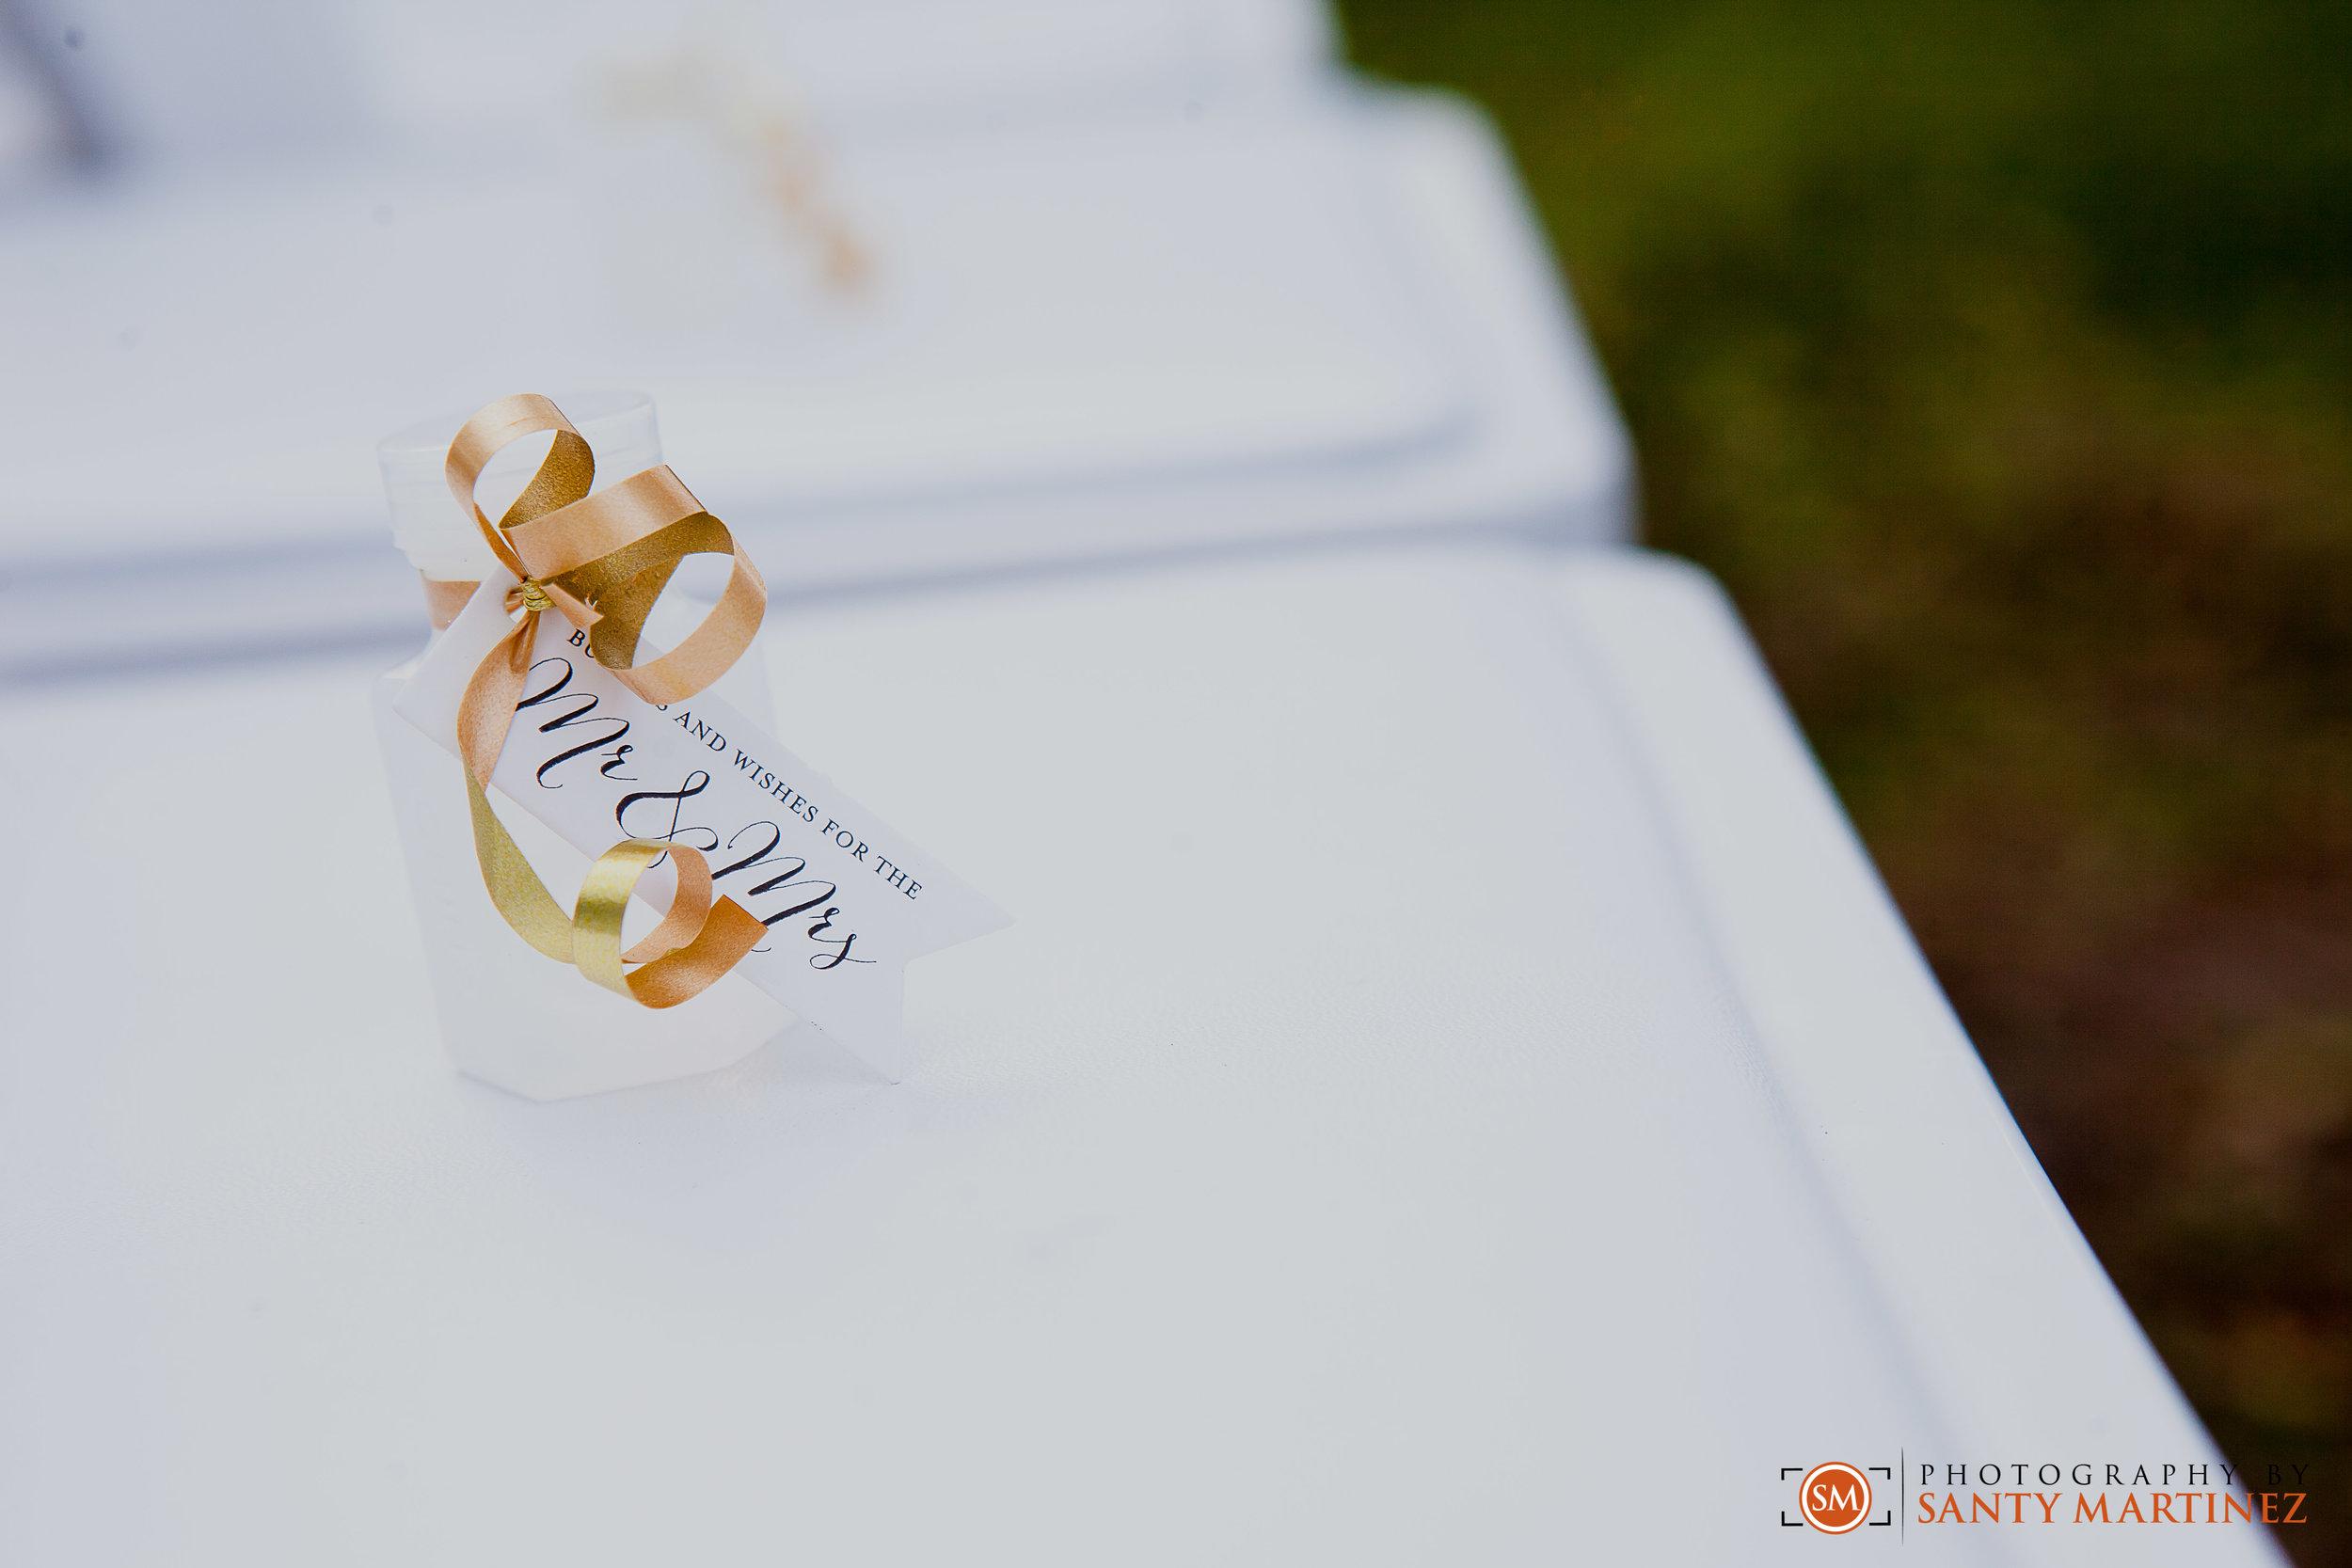 Wedding La Jolla Ballroom - Photography by Santy Martinez-27.jpg